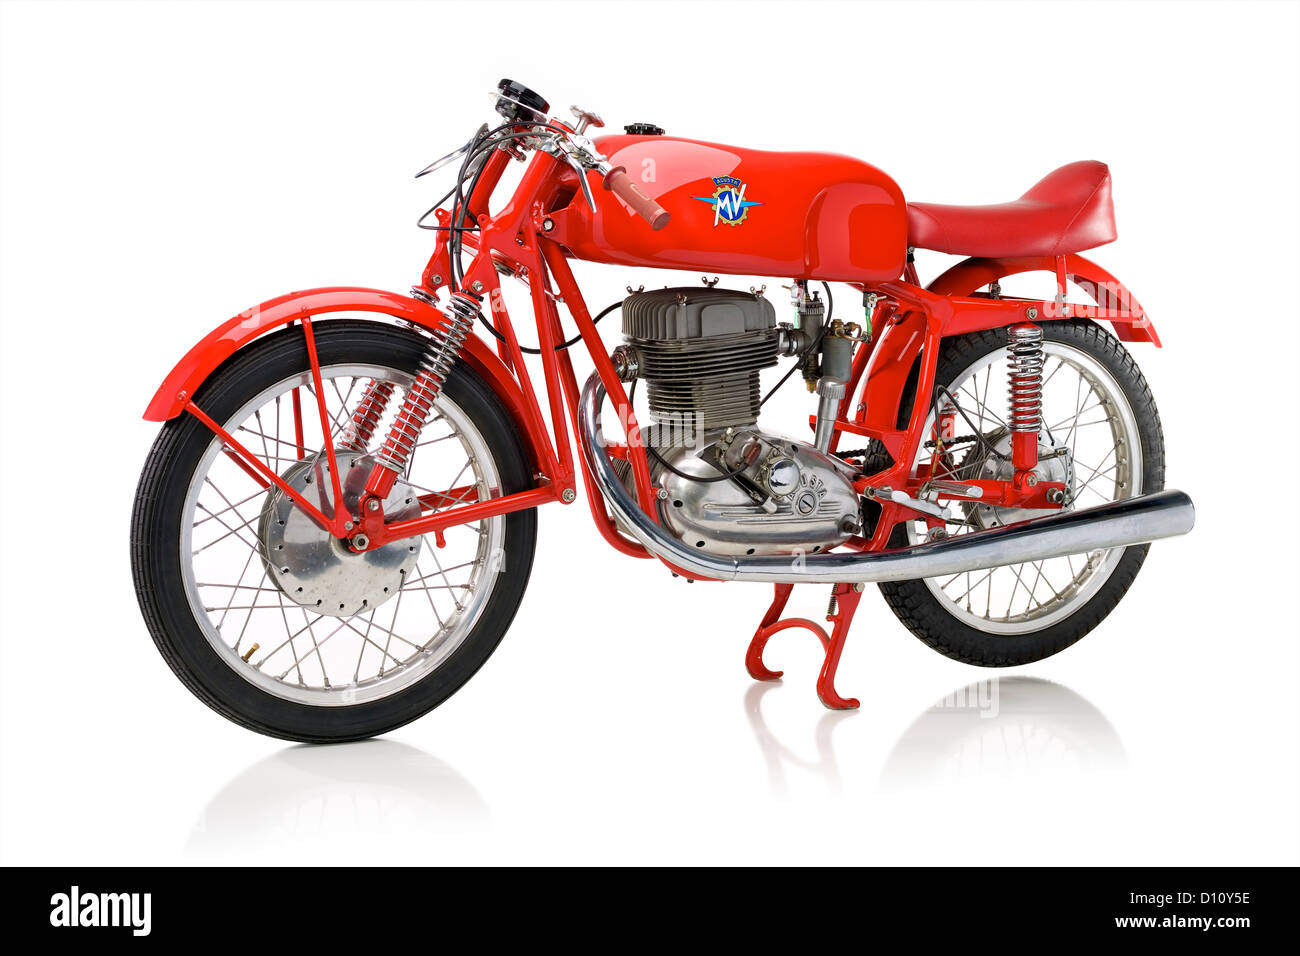 1956 MV Agusta CSS Squalo motorcycle - Stock Image